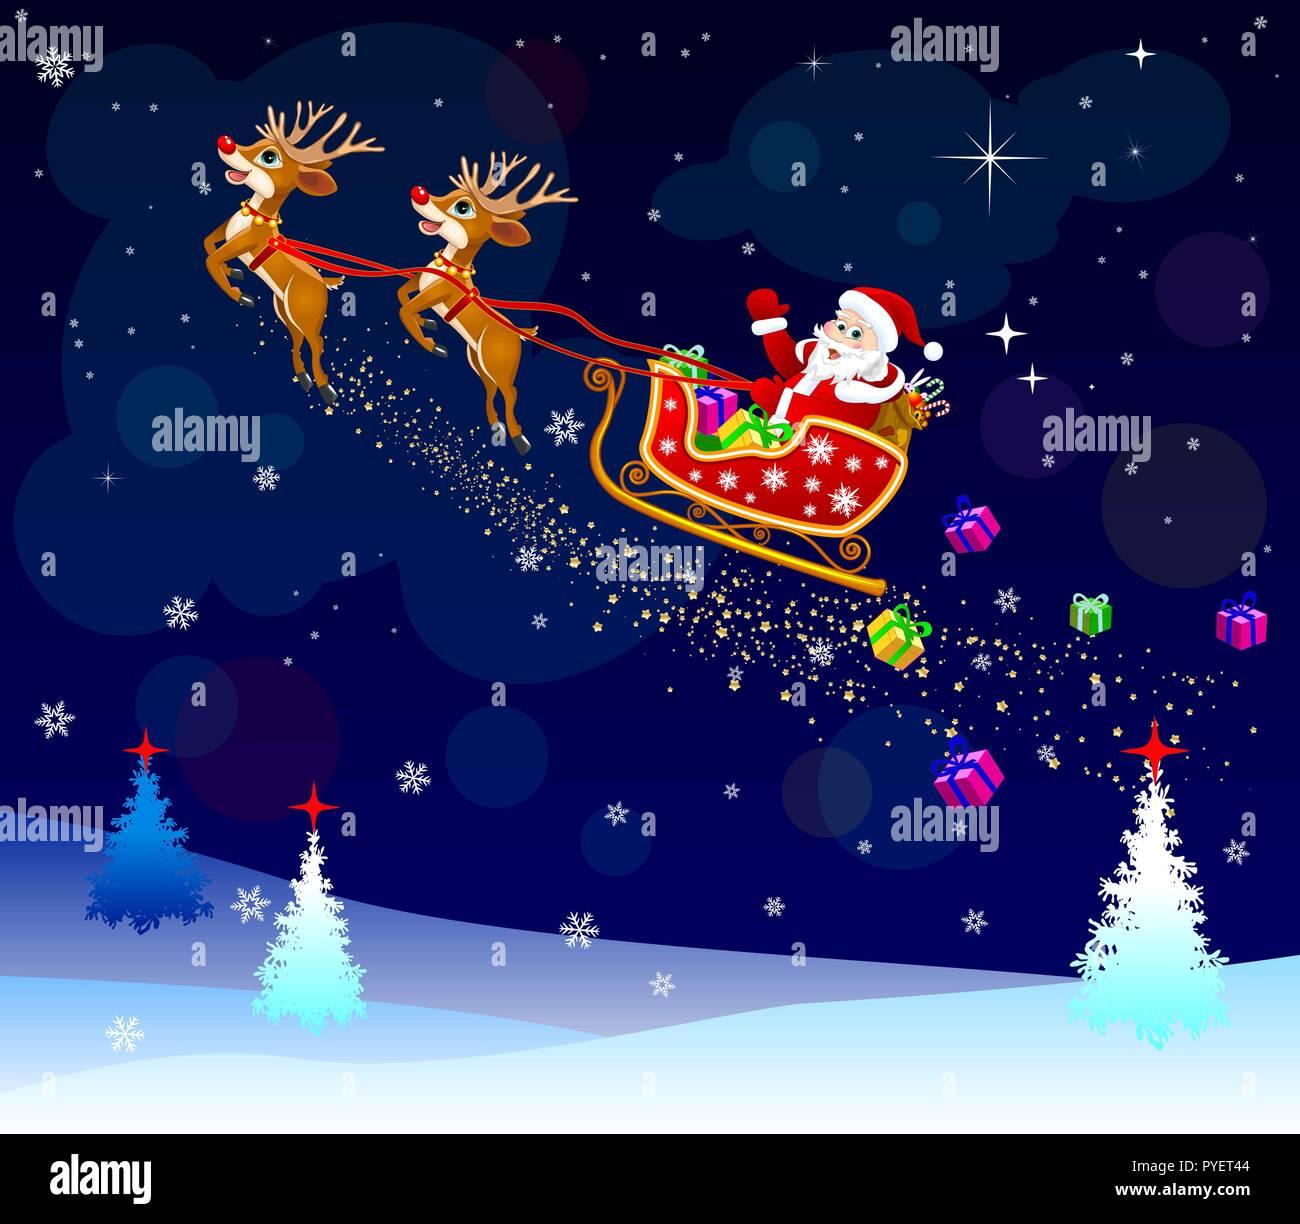 Santa Claus on his sleigh, harnessed by deer. Santa Claus with gifts on his sleigh. - Stock Image